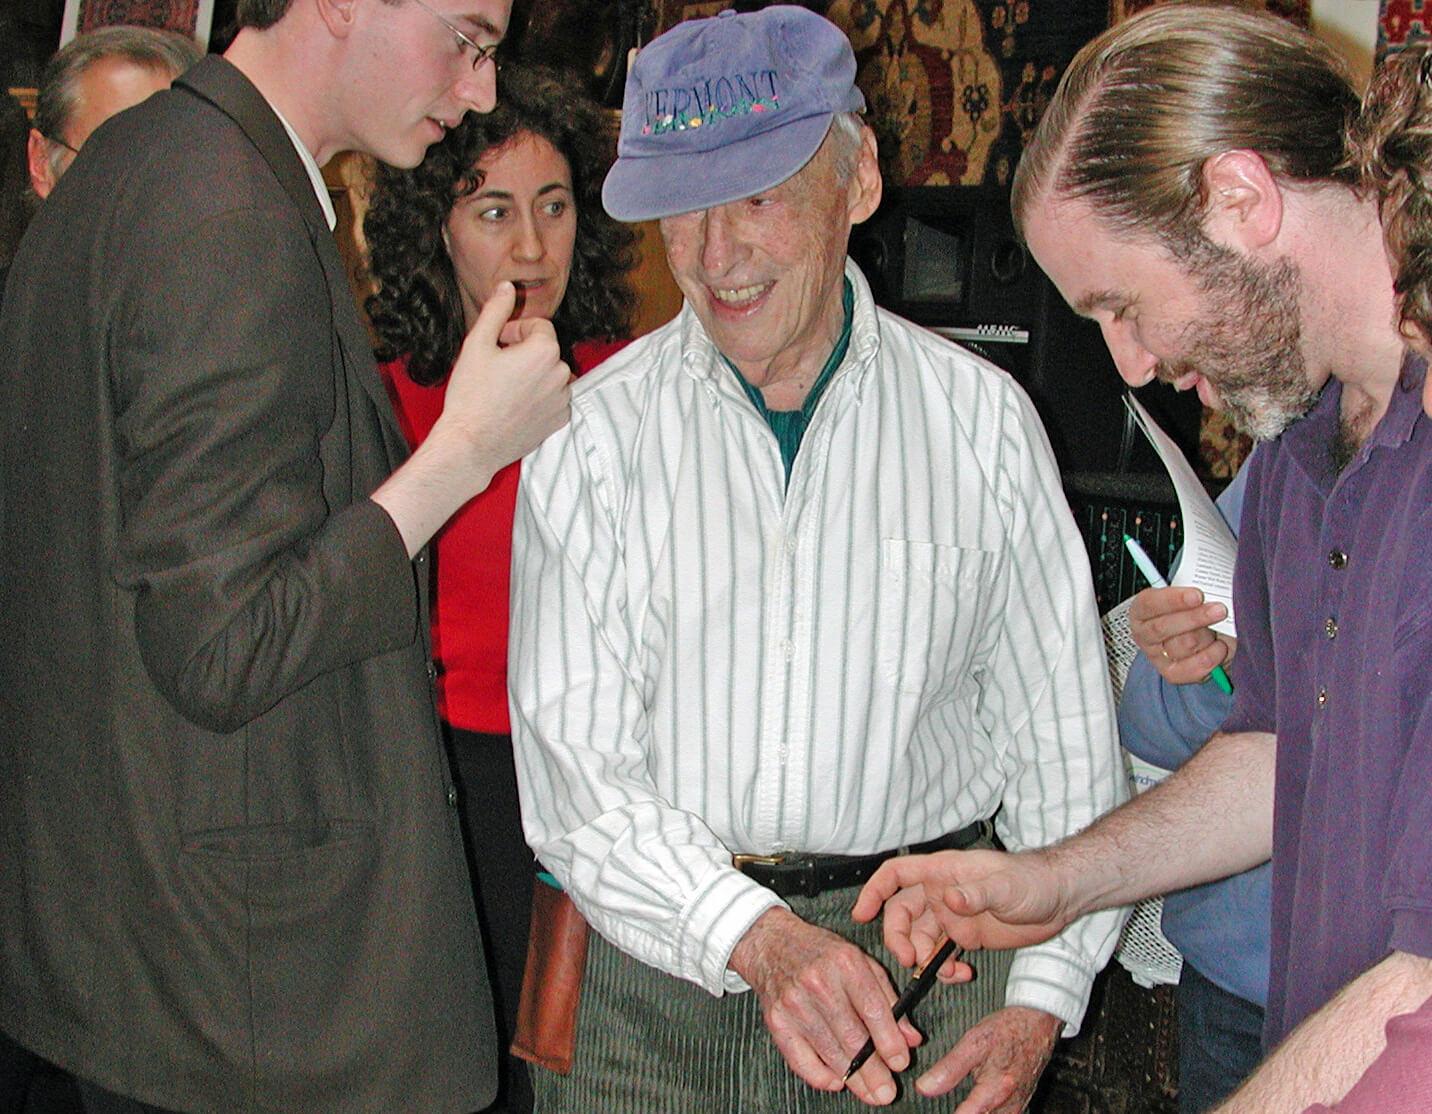 Saul Bellow at the Brattleboro Literary Festival